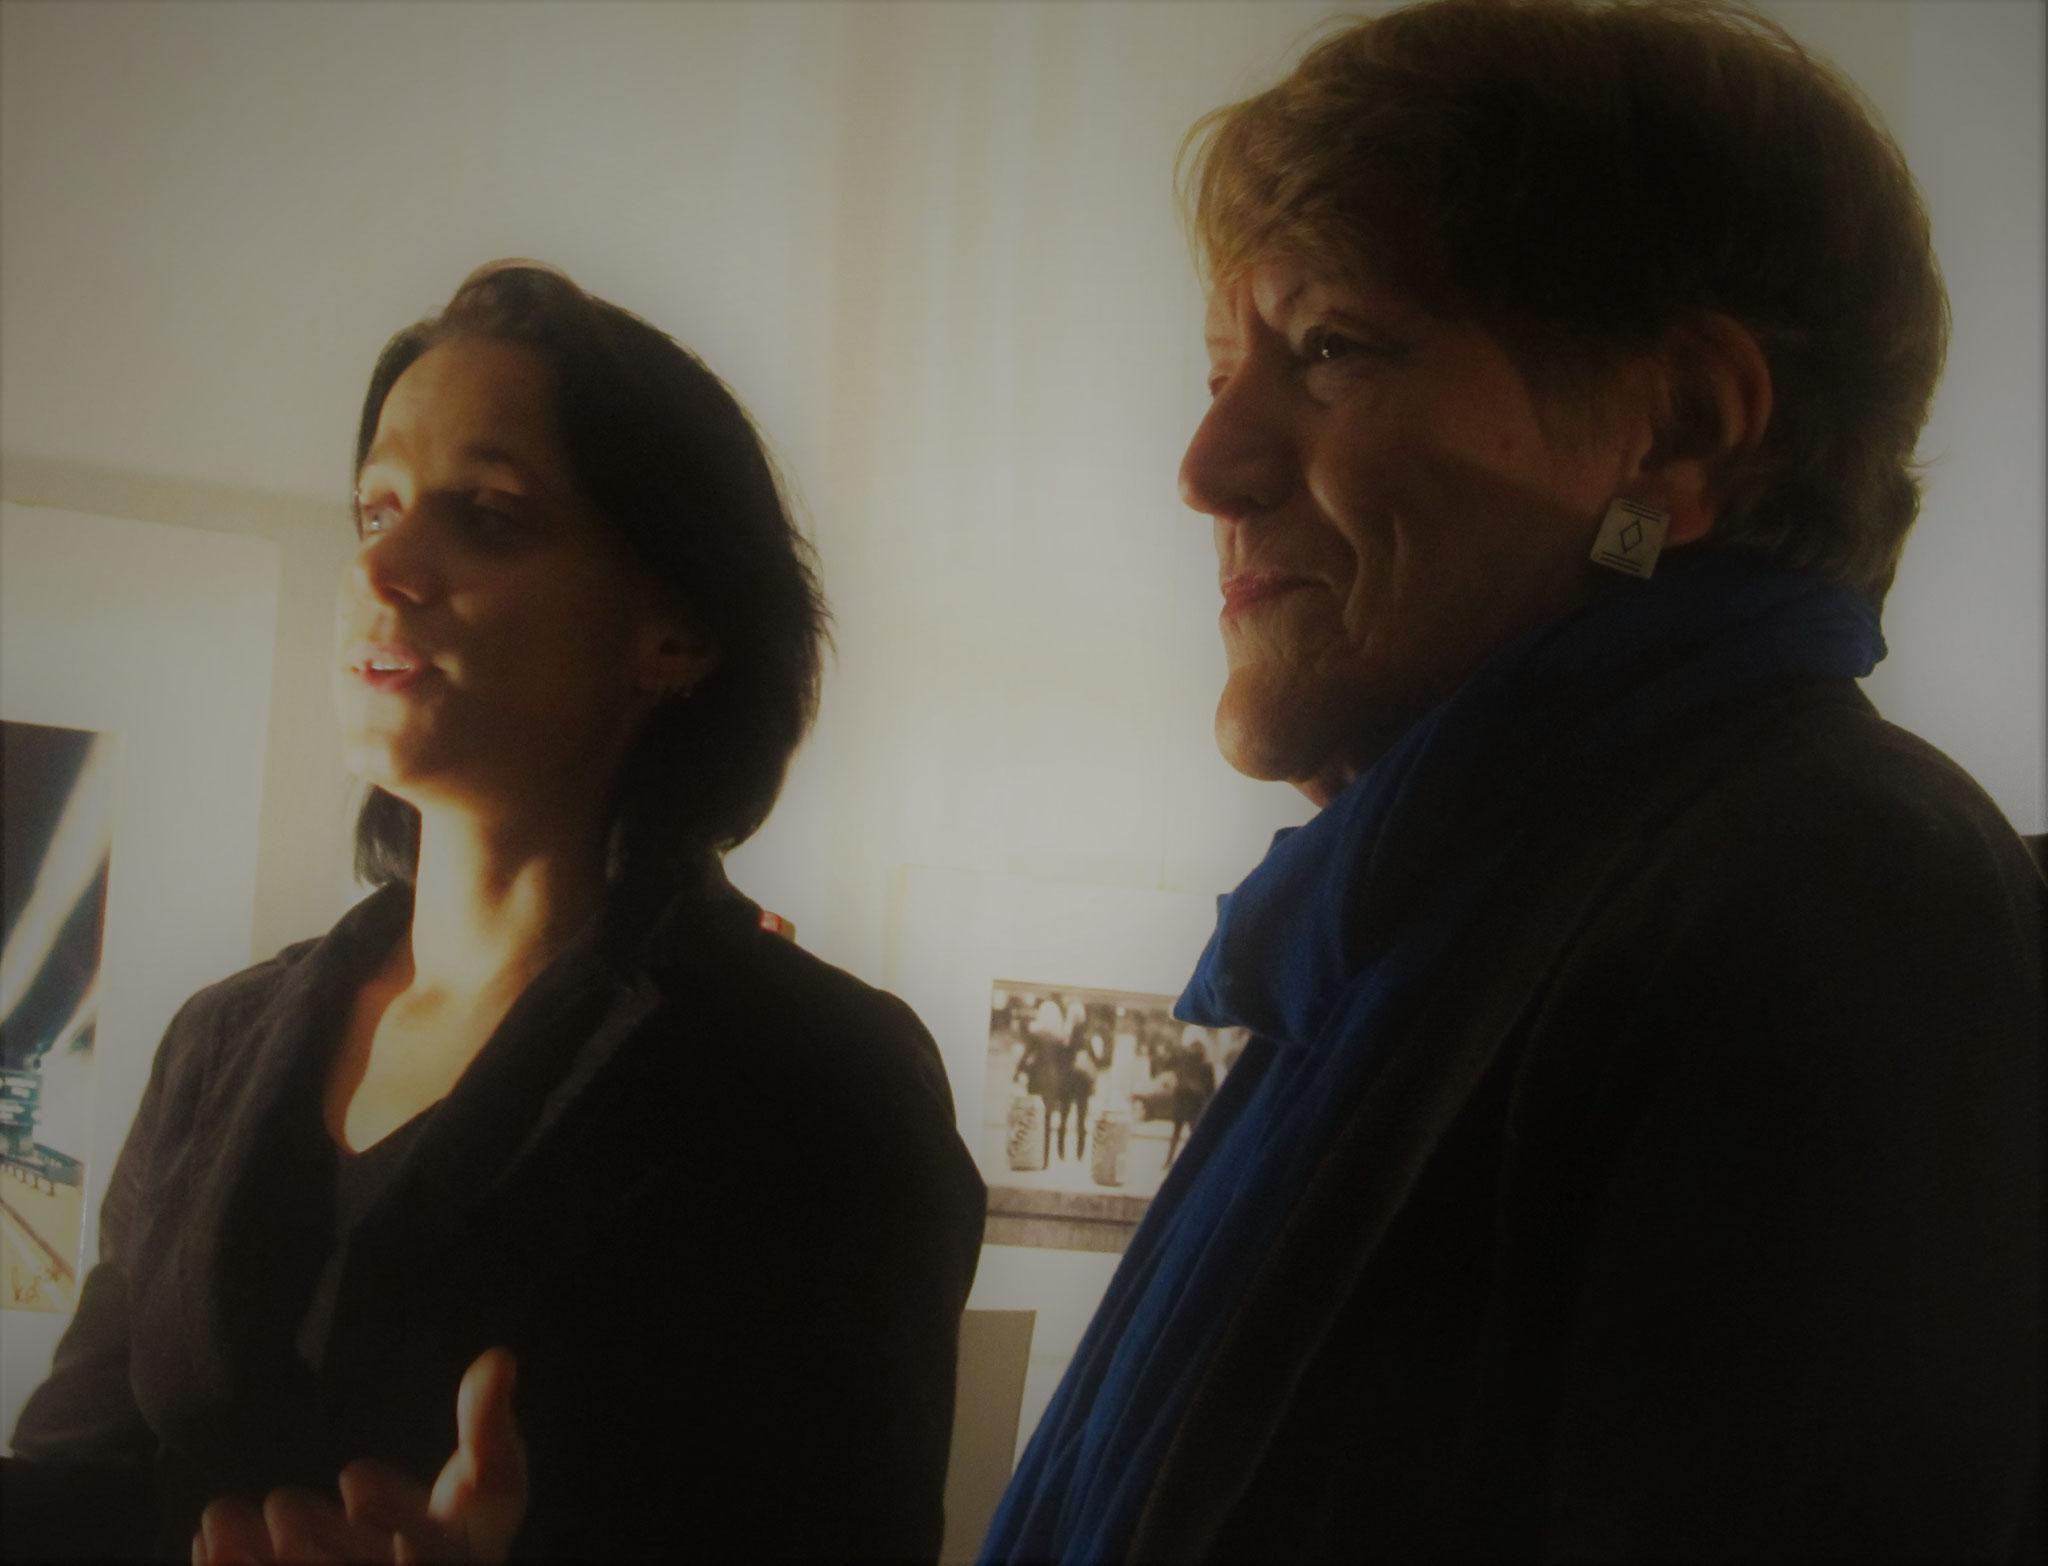 Moderatorin Sabine Brandl (links), Hedwig M Kraus (rechts)